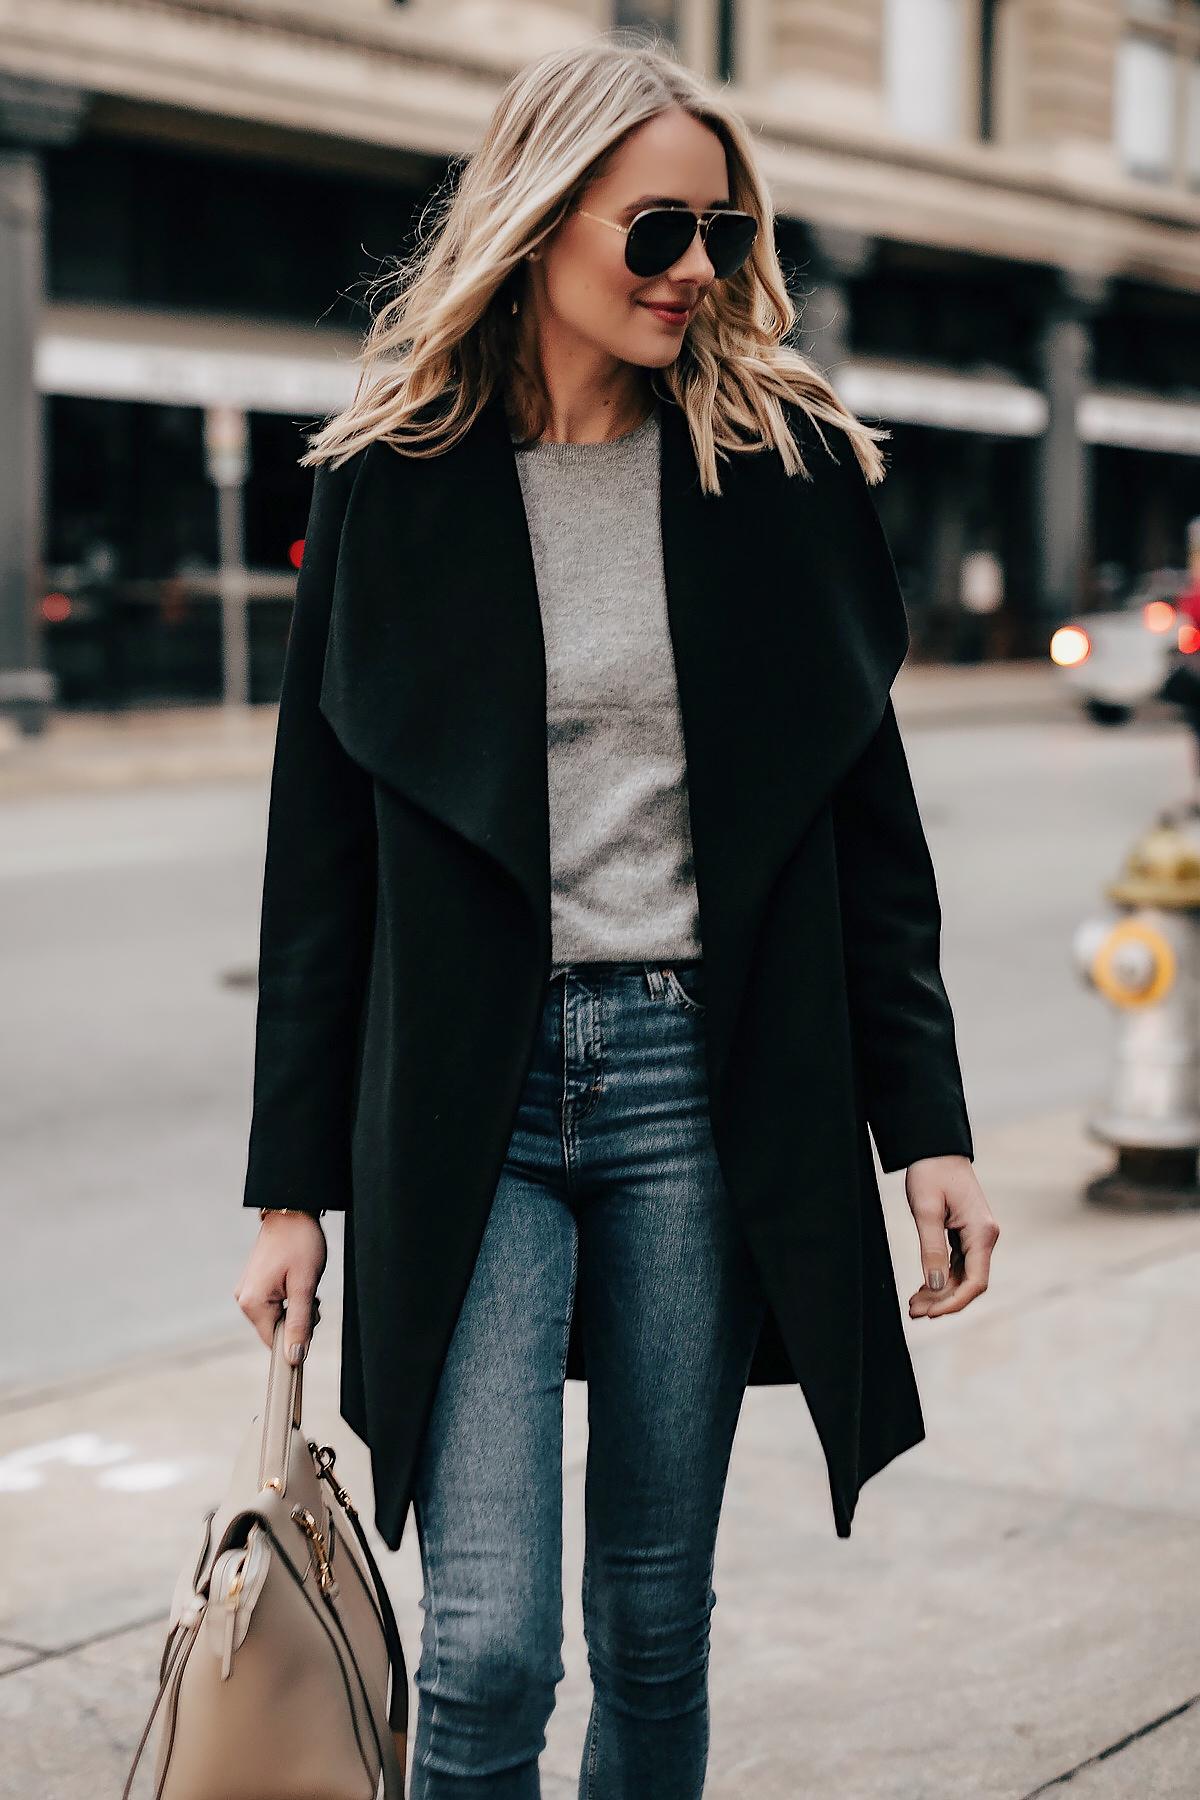 Blonde Woman Wearing Black Wrap Coat Grey Sweater Denim Skinny Jeans Fashion Jackson San Diego Fashion Blogger Street Style